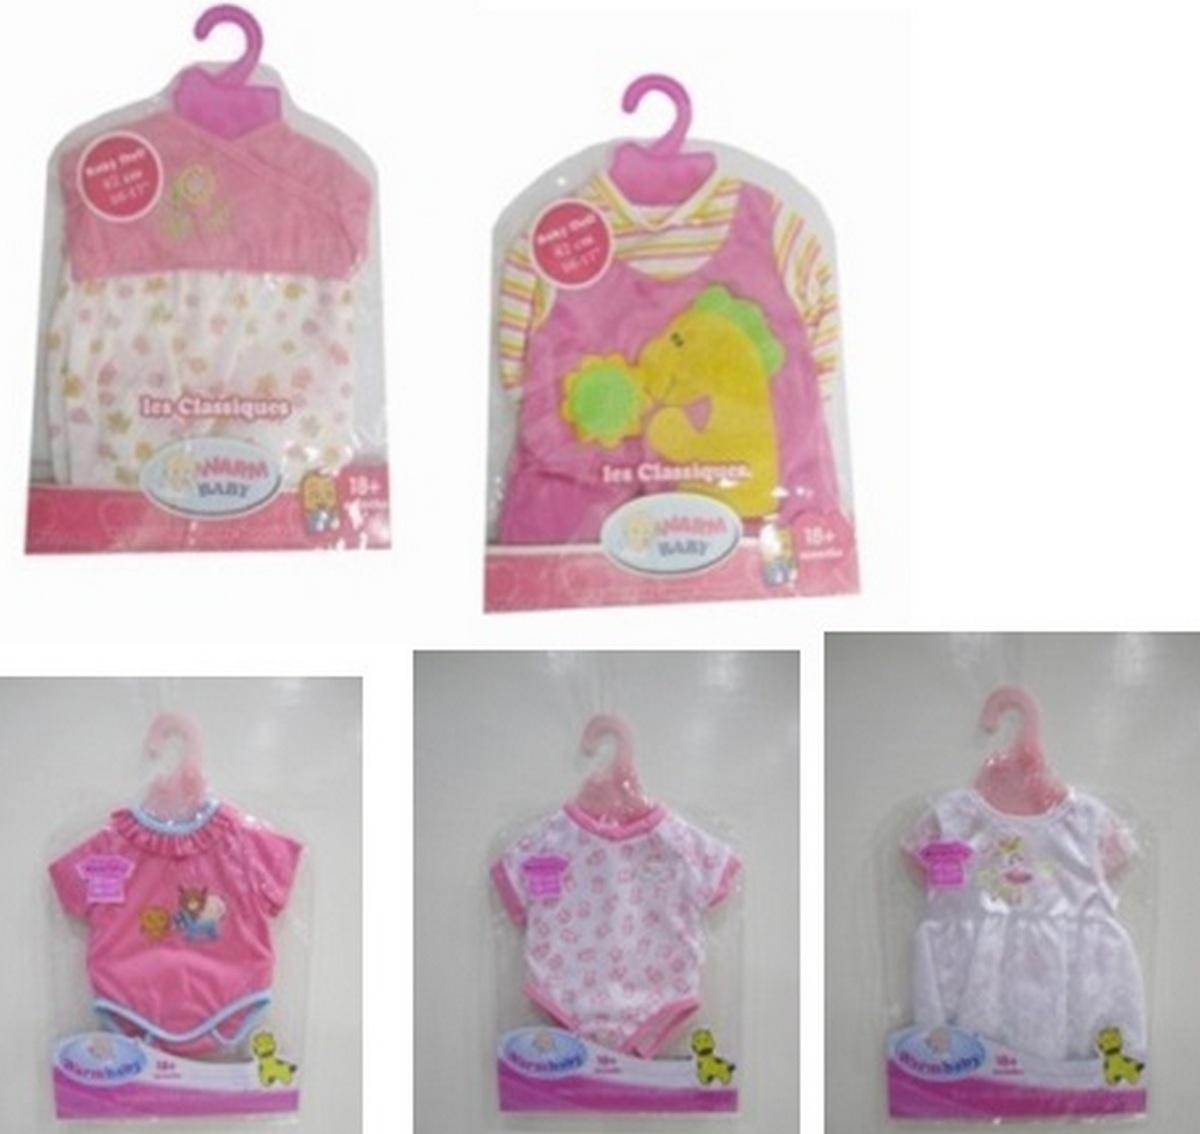 baby doll Одежда для пупса 5 видов DBJ-17950436743